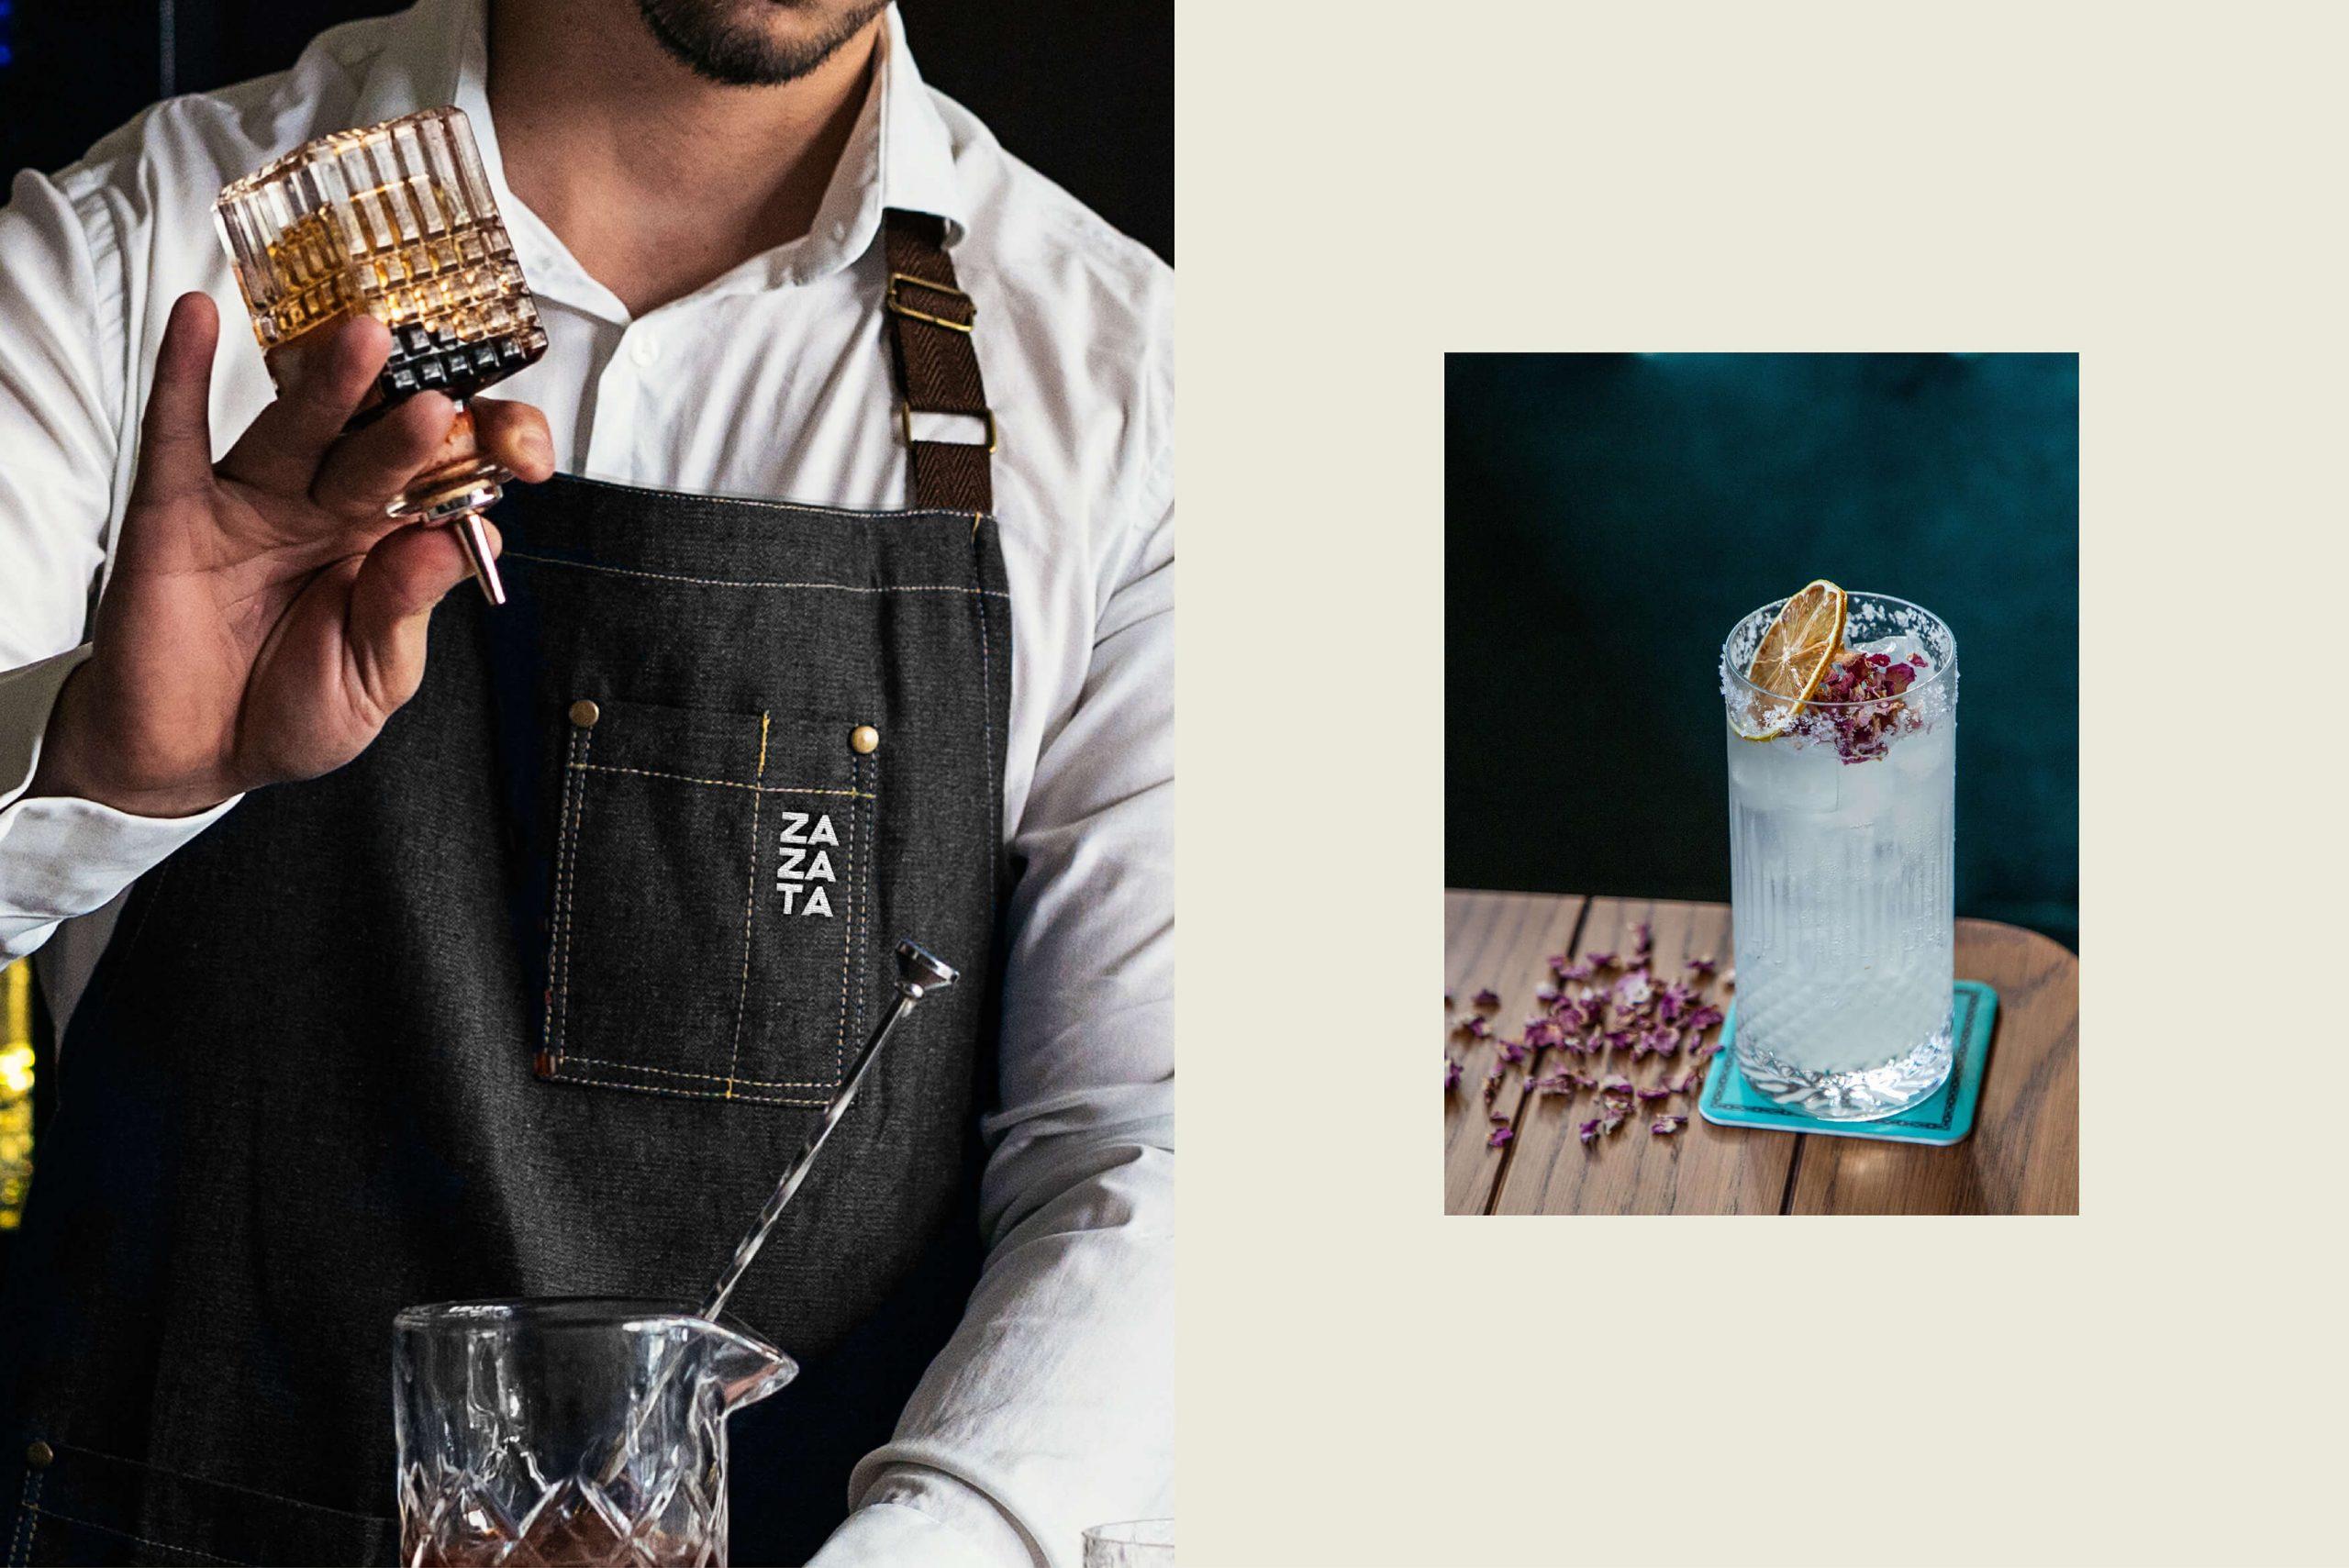 Ovolo Za Za Ta Hospitality Visual Identity - Mixologist and cocktail photography